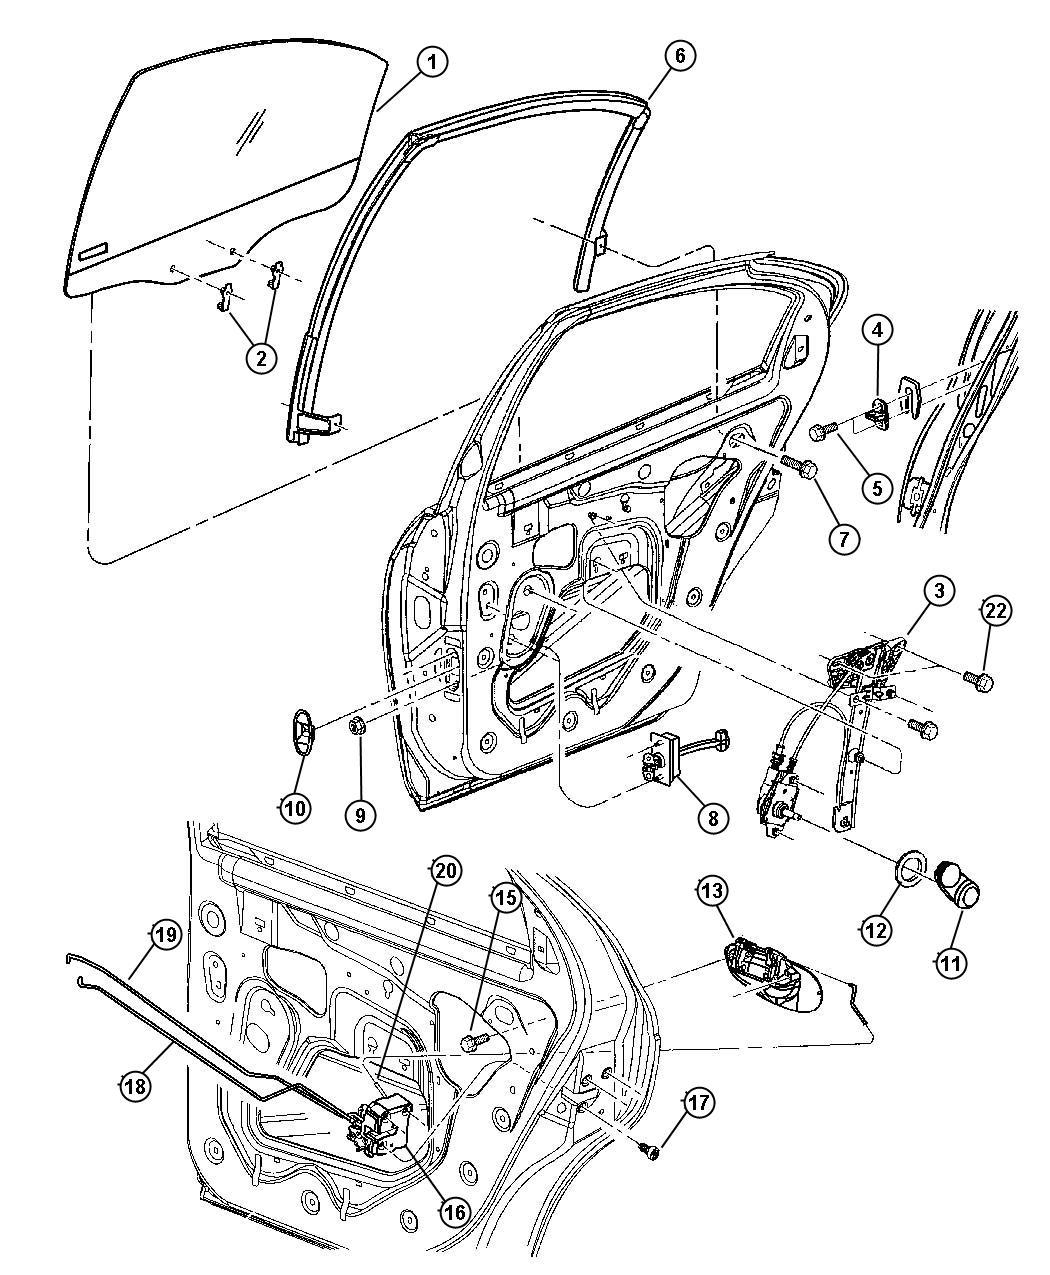 2008 Dodge Avenger Handle. Window regulator. Trim: [all